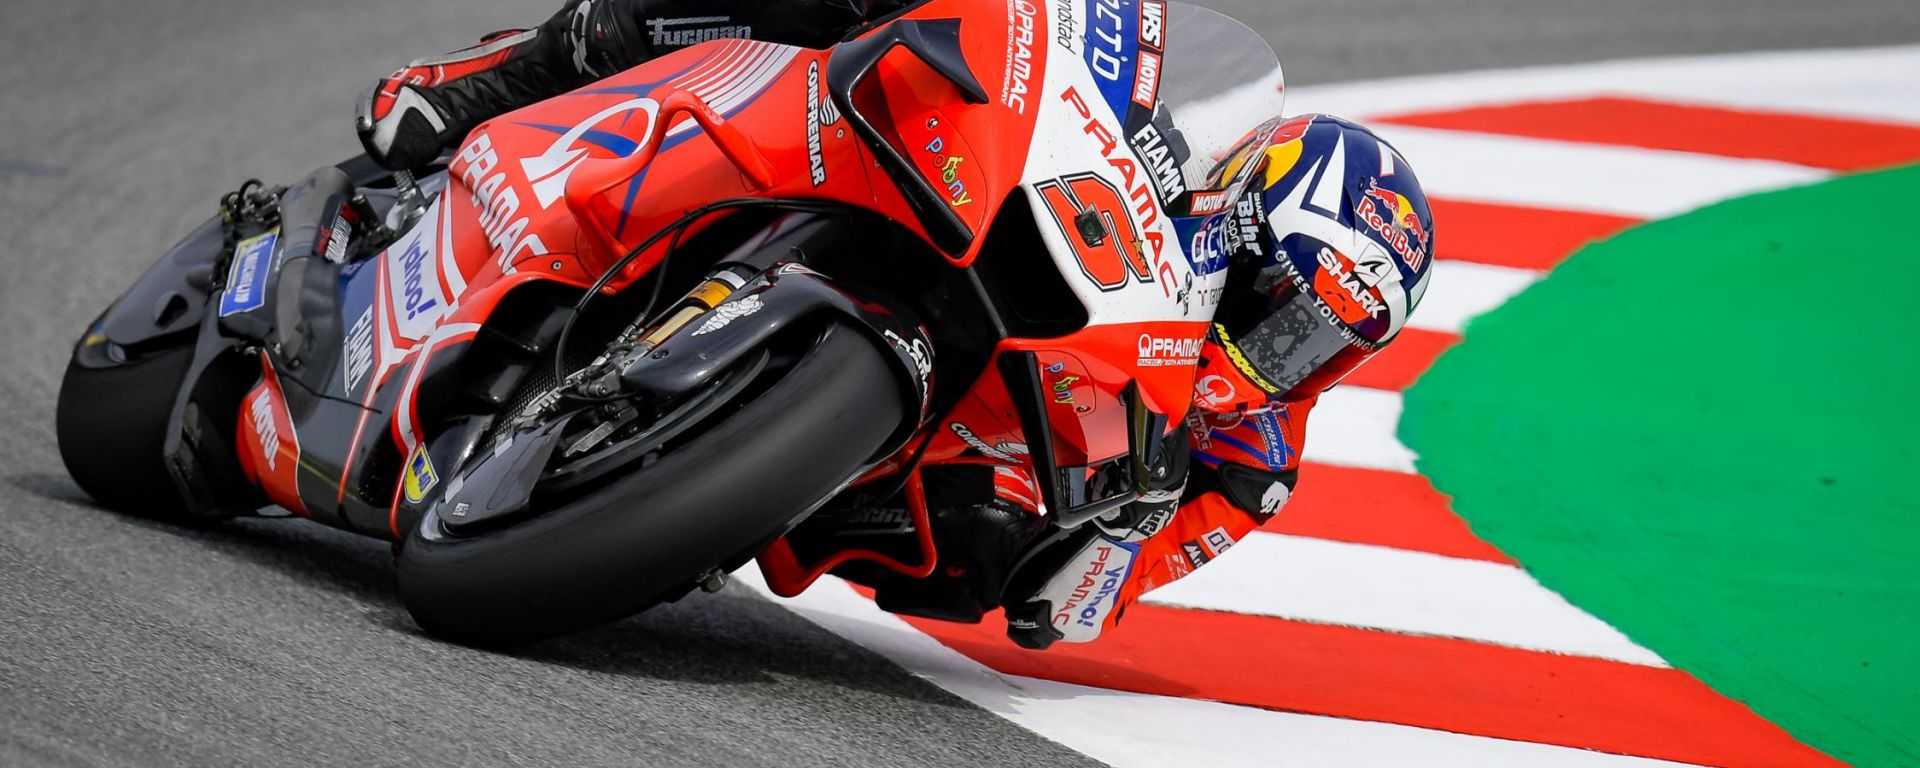 MotoGP Catalunya 2021, Johann Zarco (Ducati Pramac)